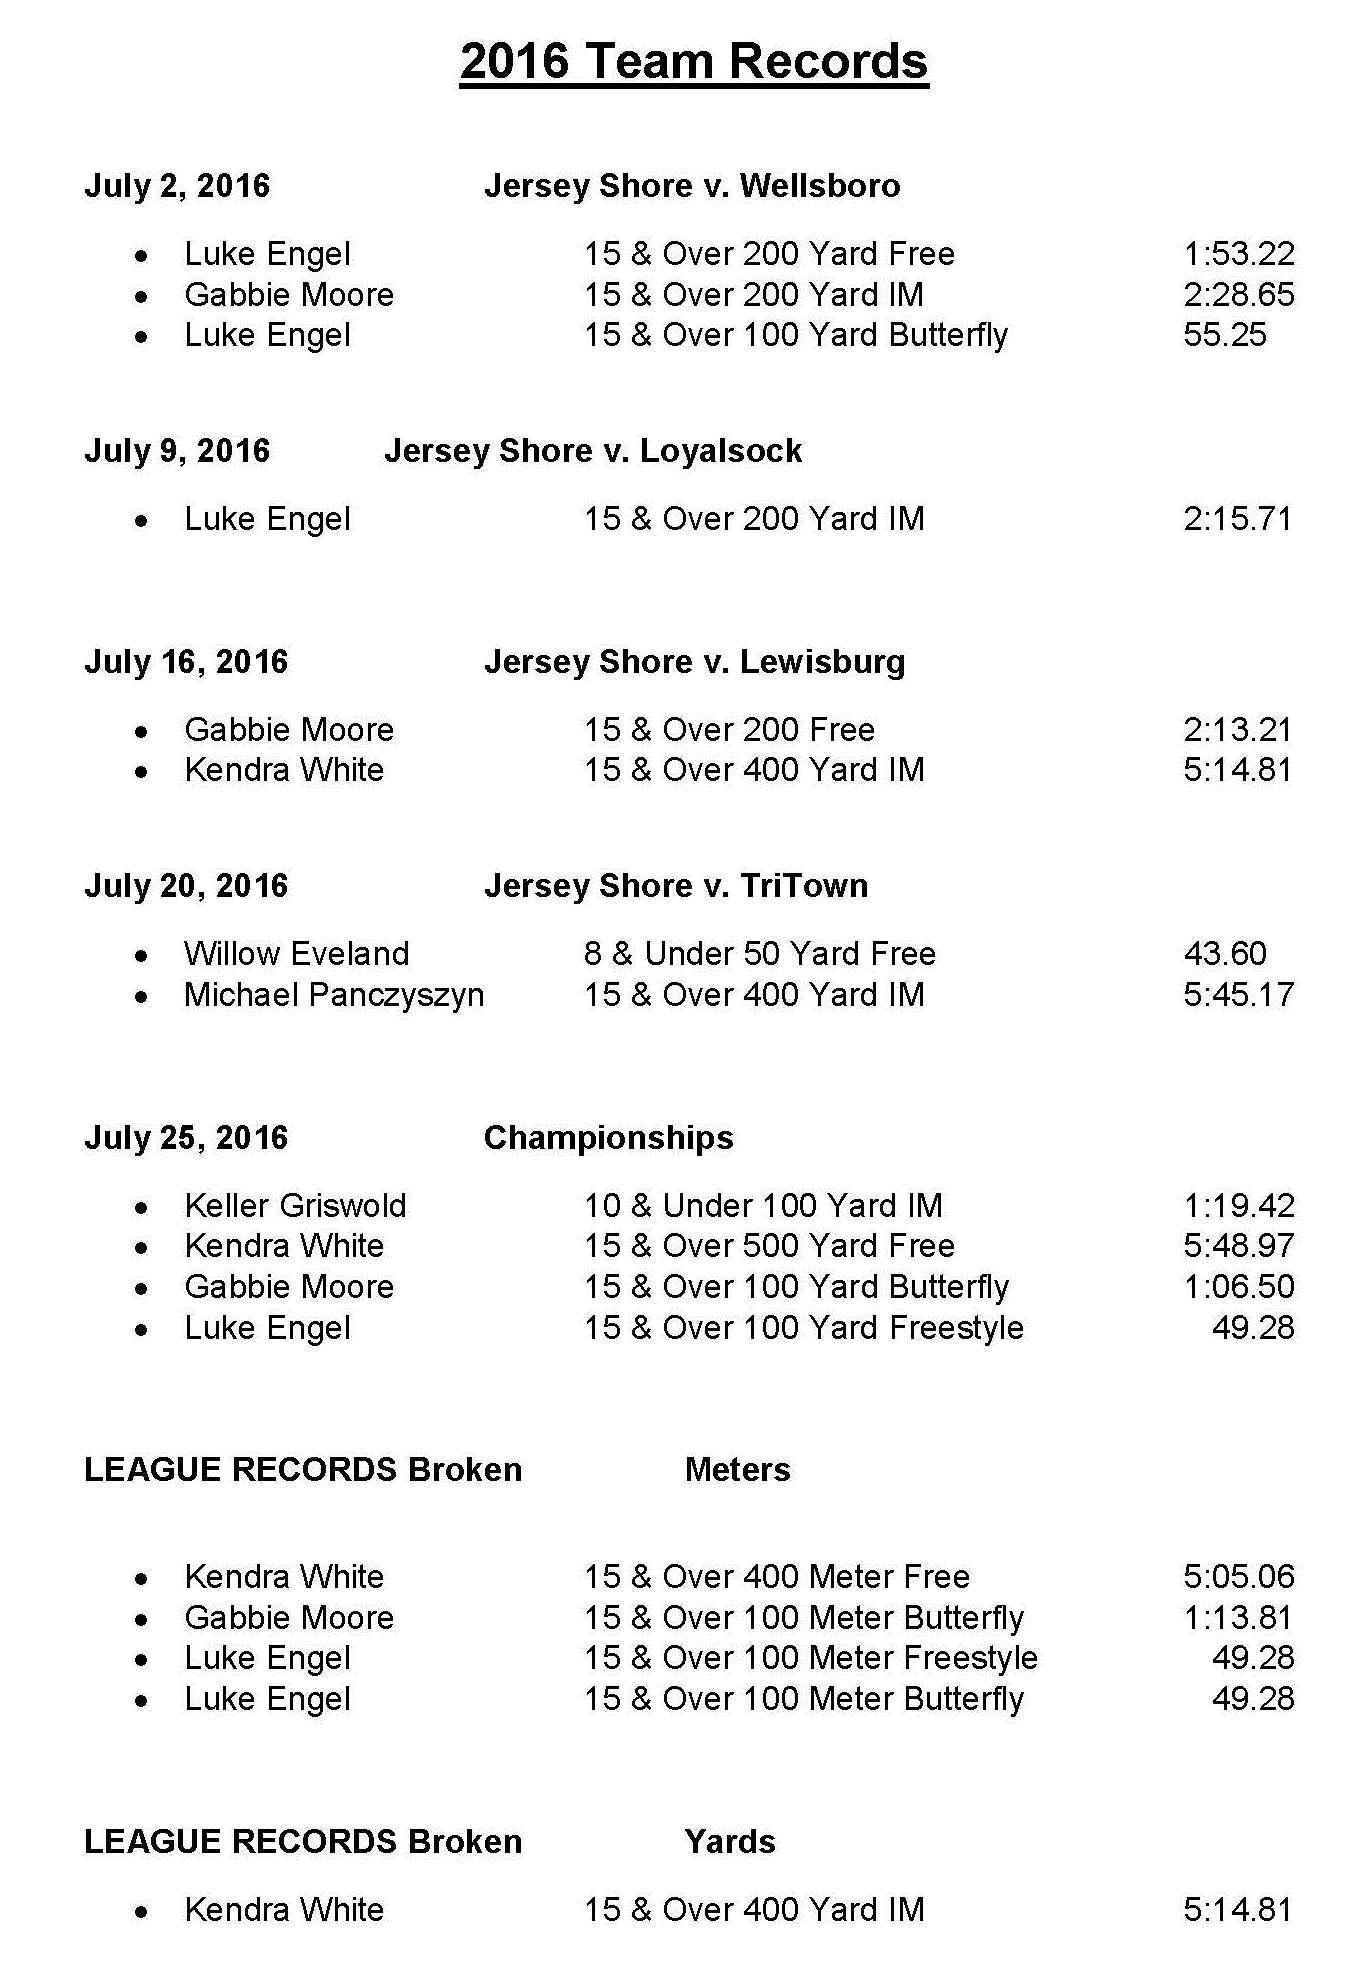 2016 Team & League Records Broken